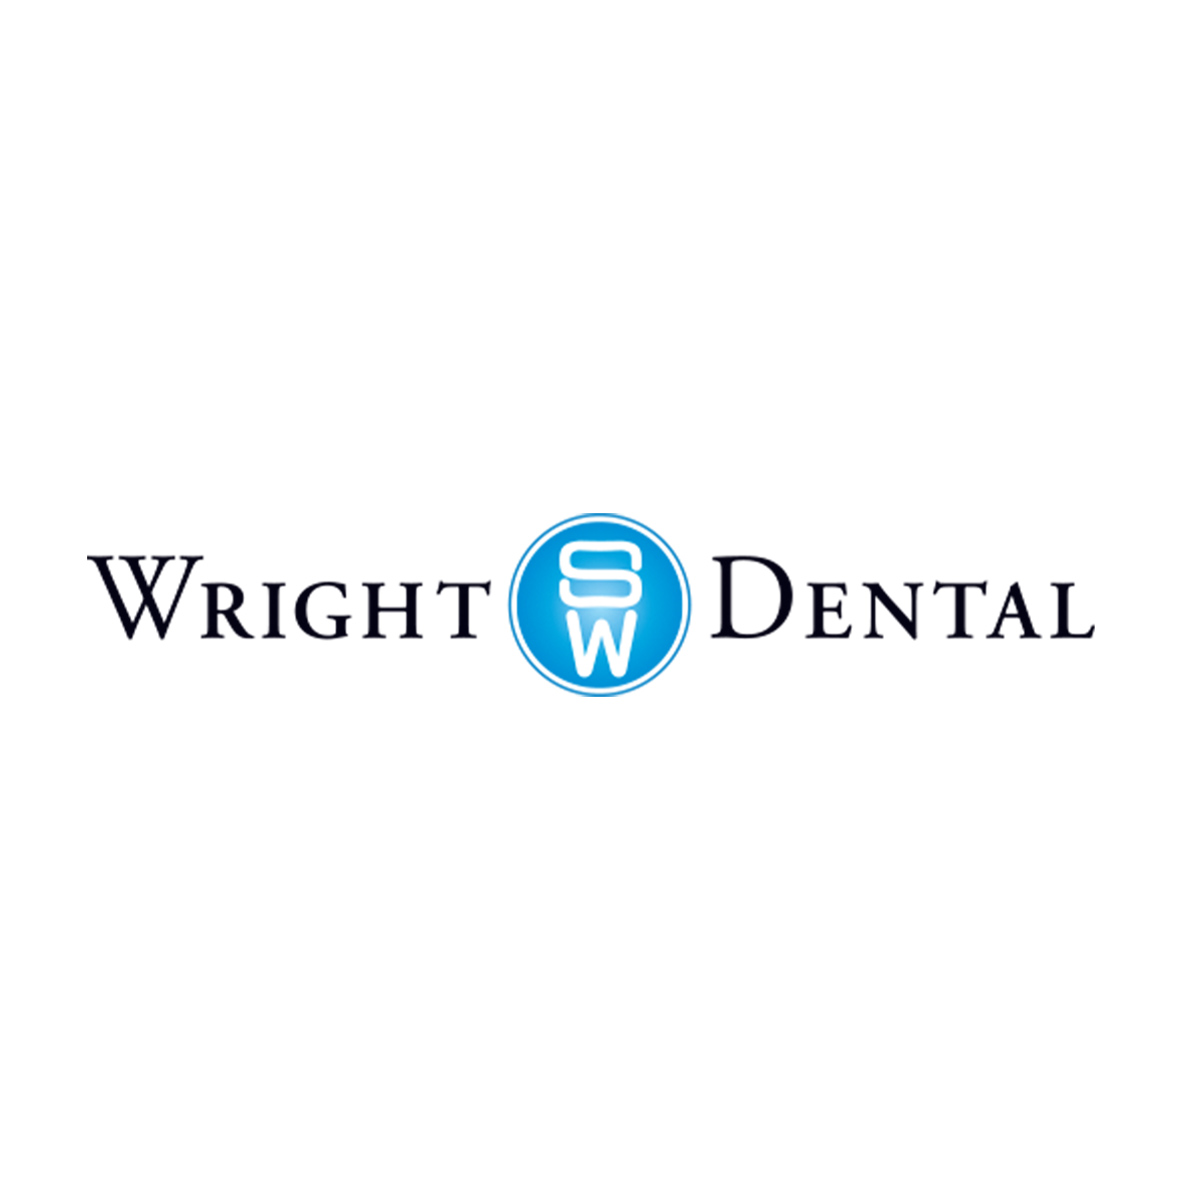 Wright Dental